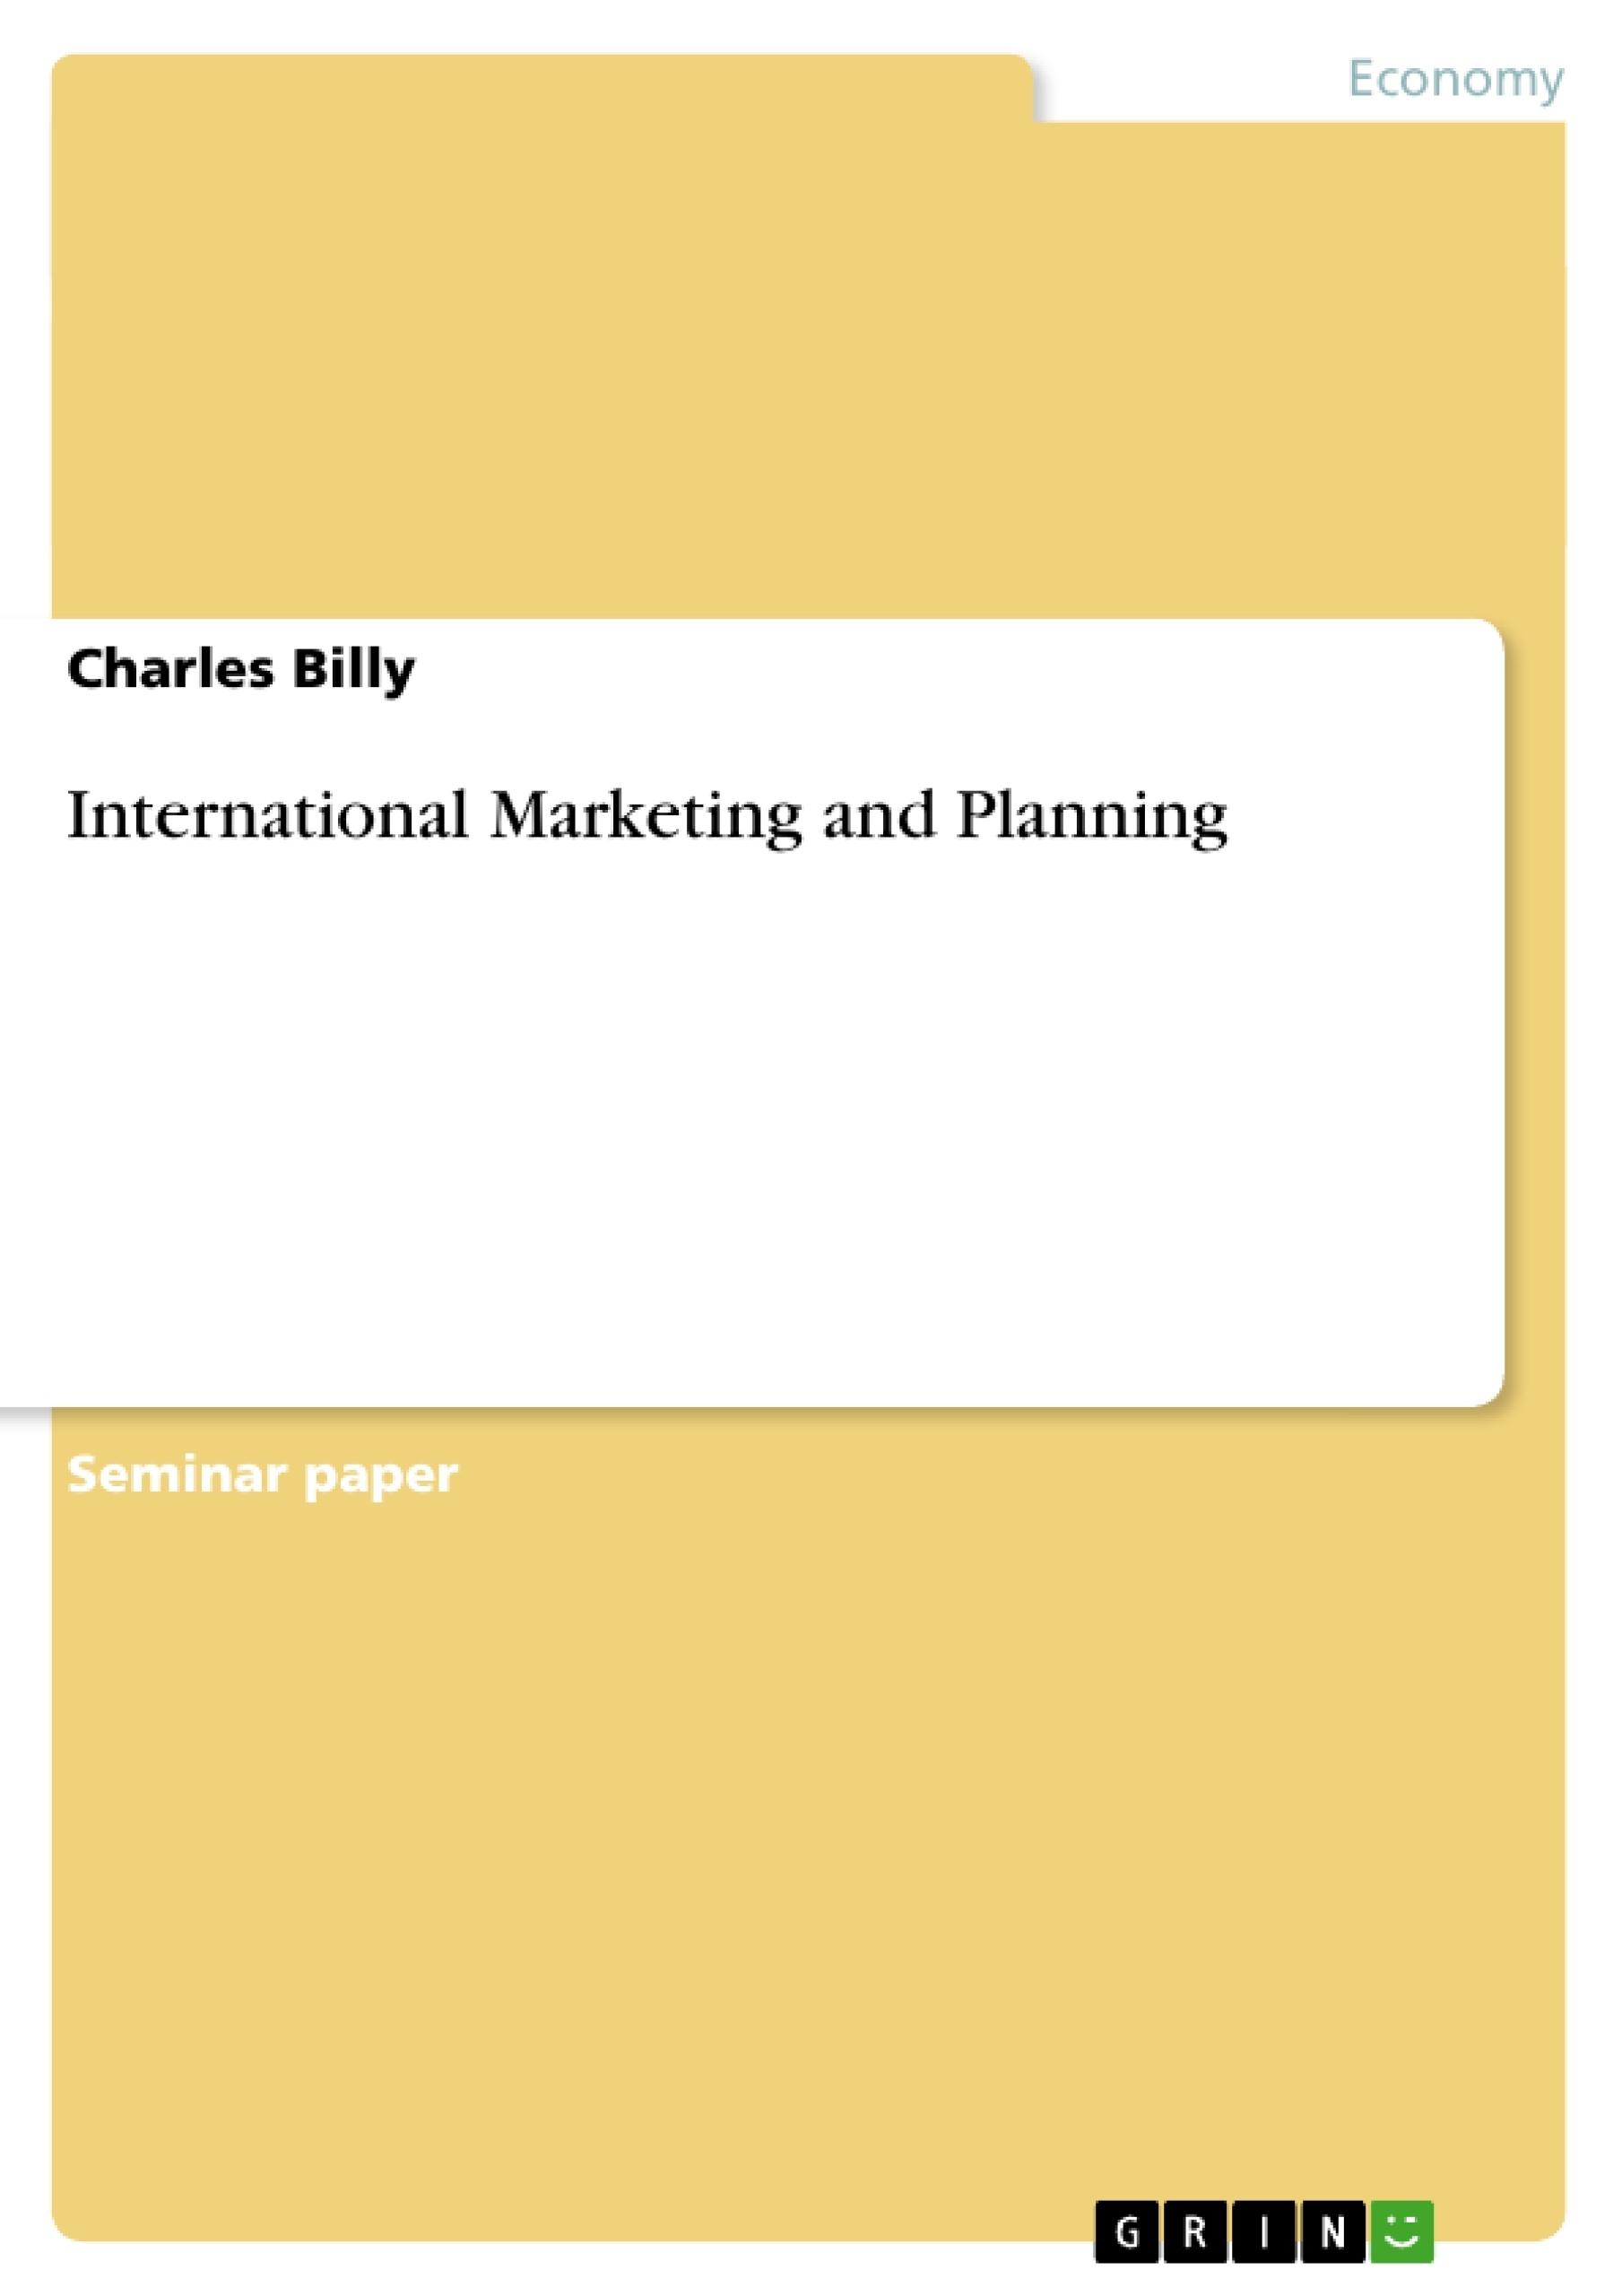 Title: International Marketing and Planning